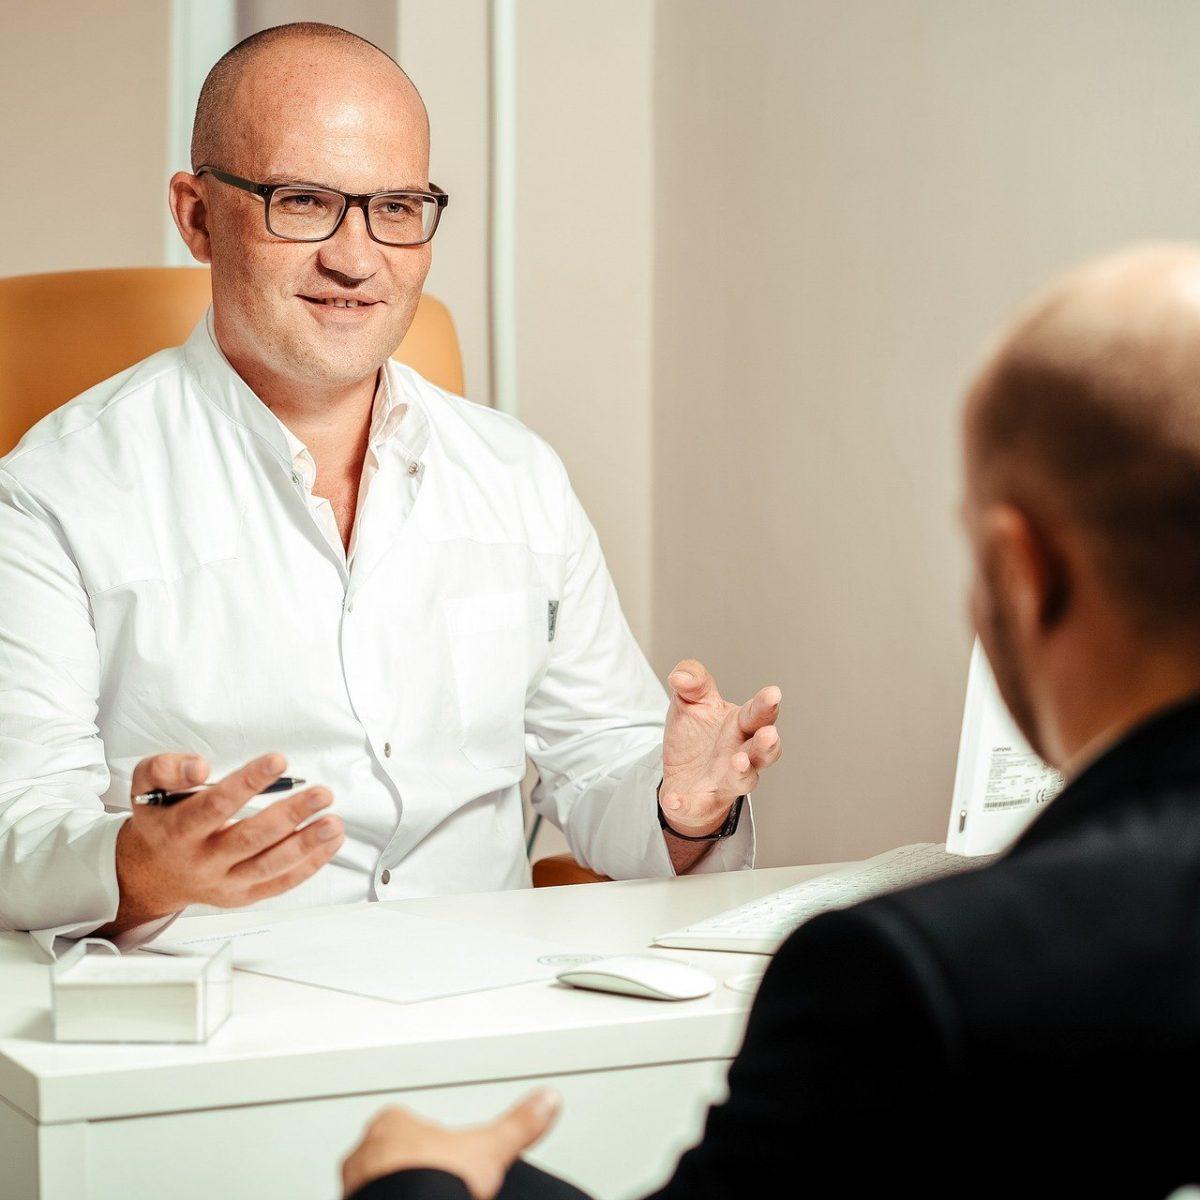 Doctor Patient Consultation Discussion Psychiatrist